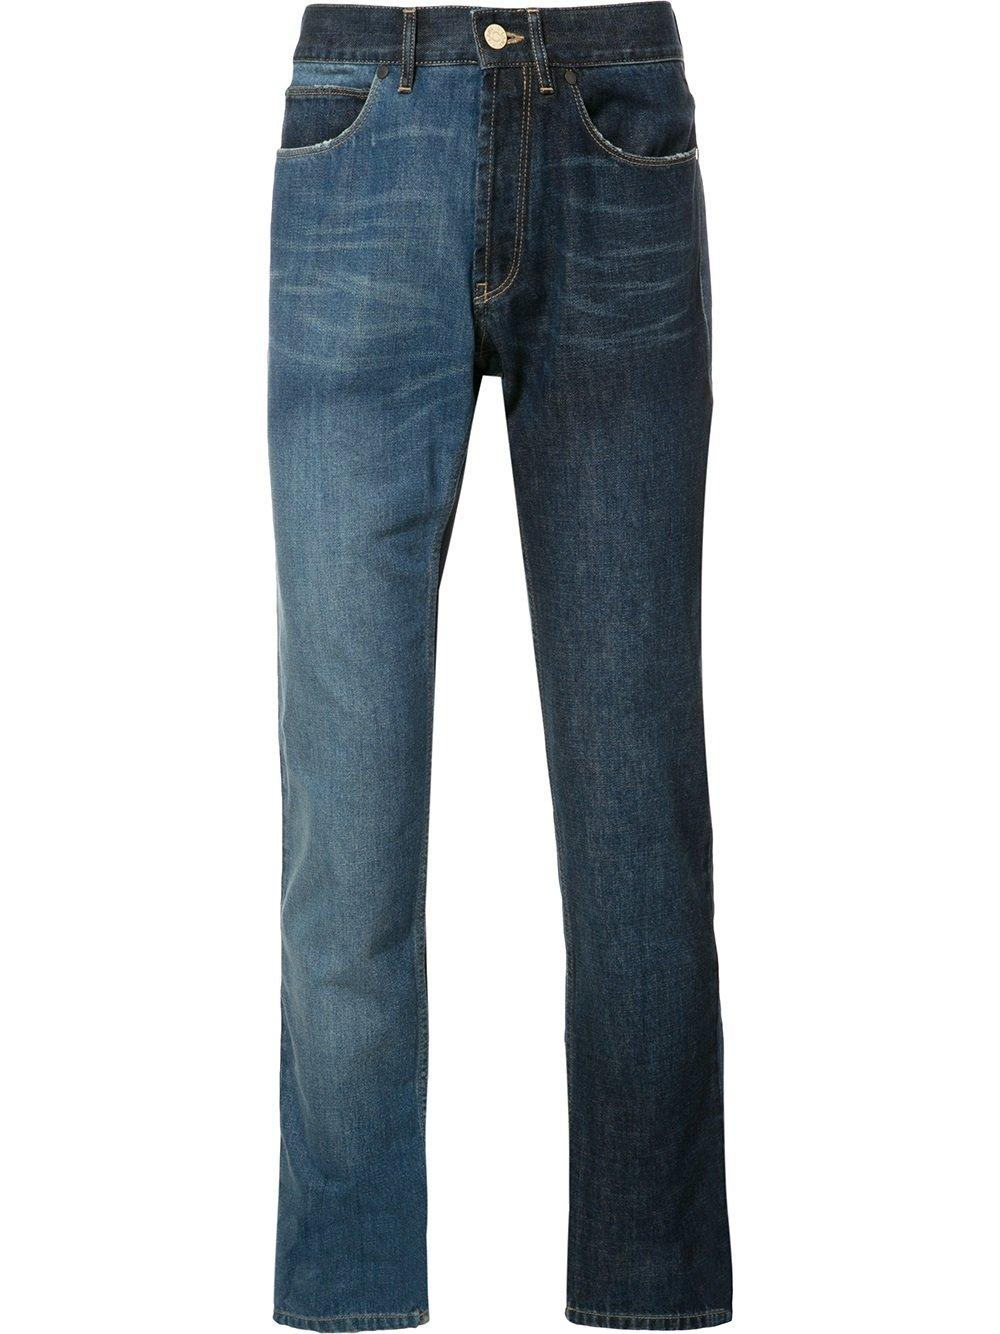 Lanvin Two tone Contrast Skinny Jeans In Blue For Men Lyst